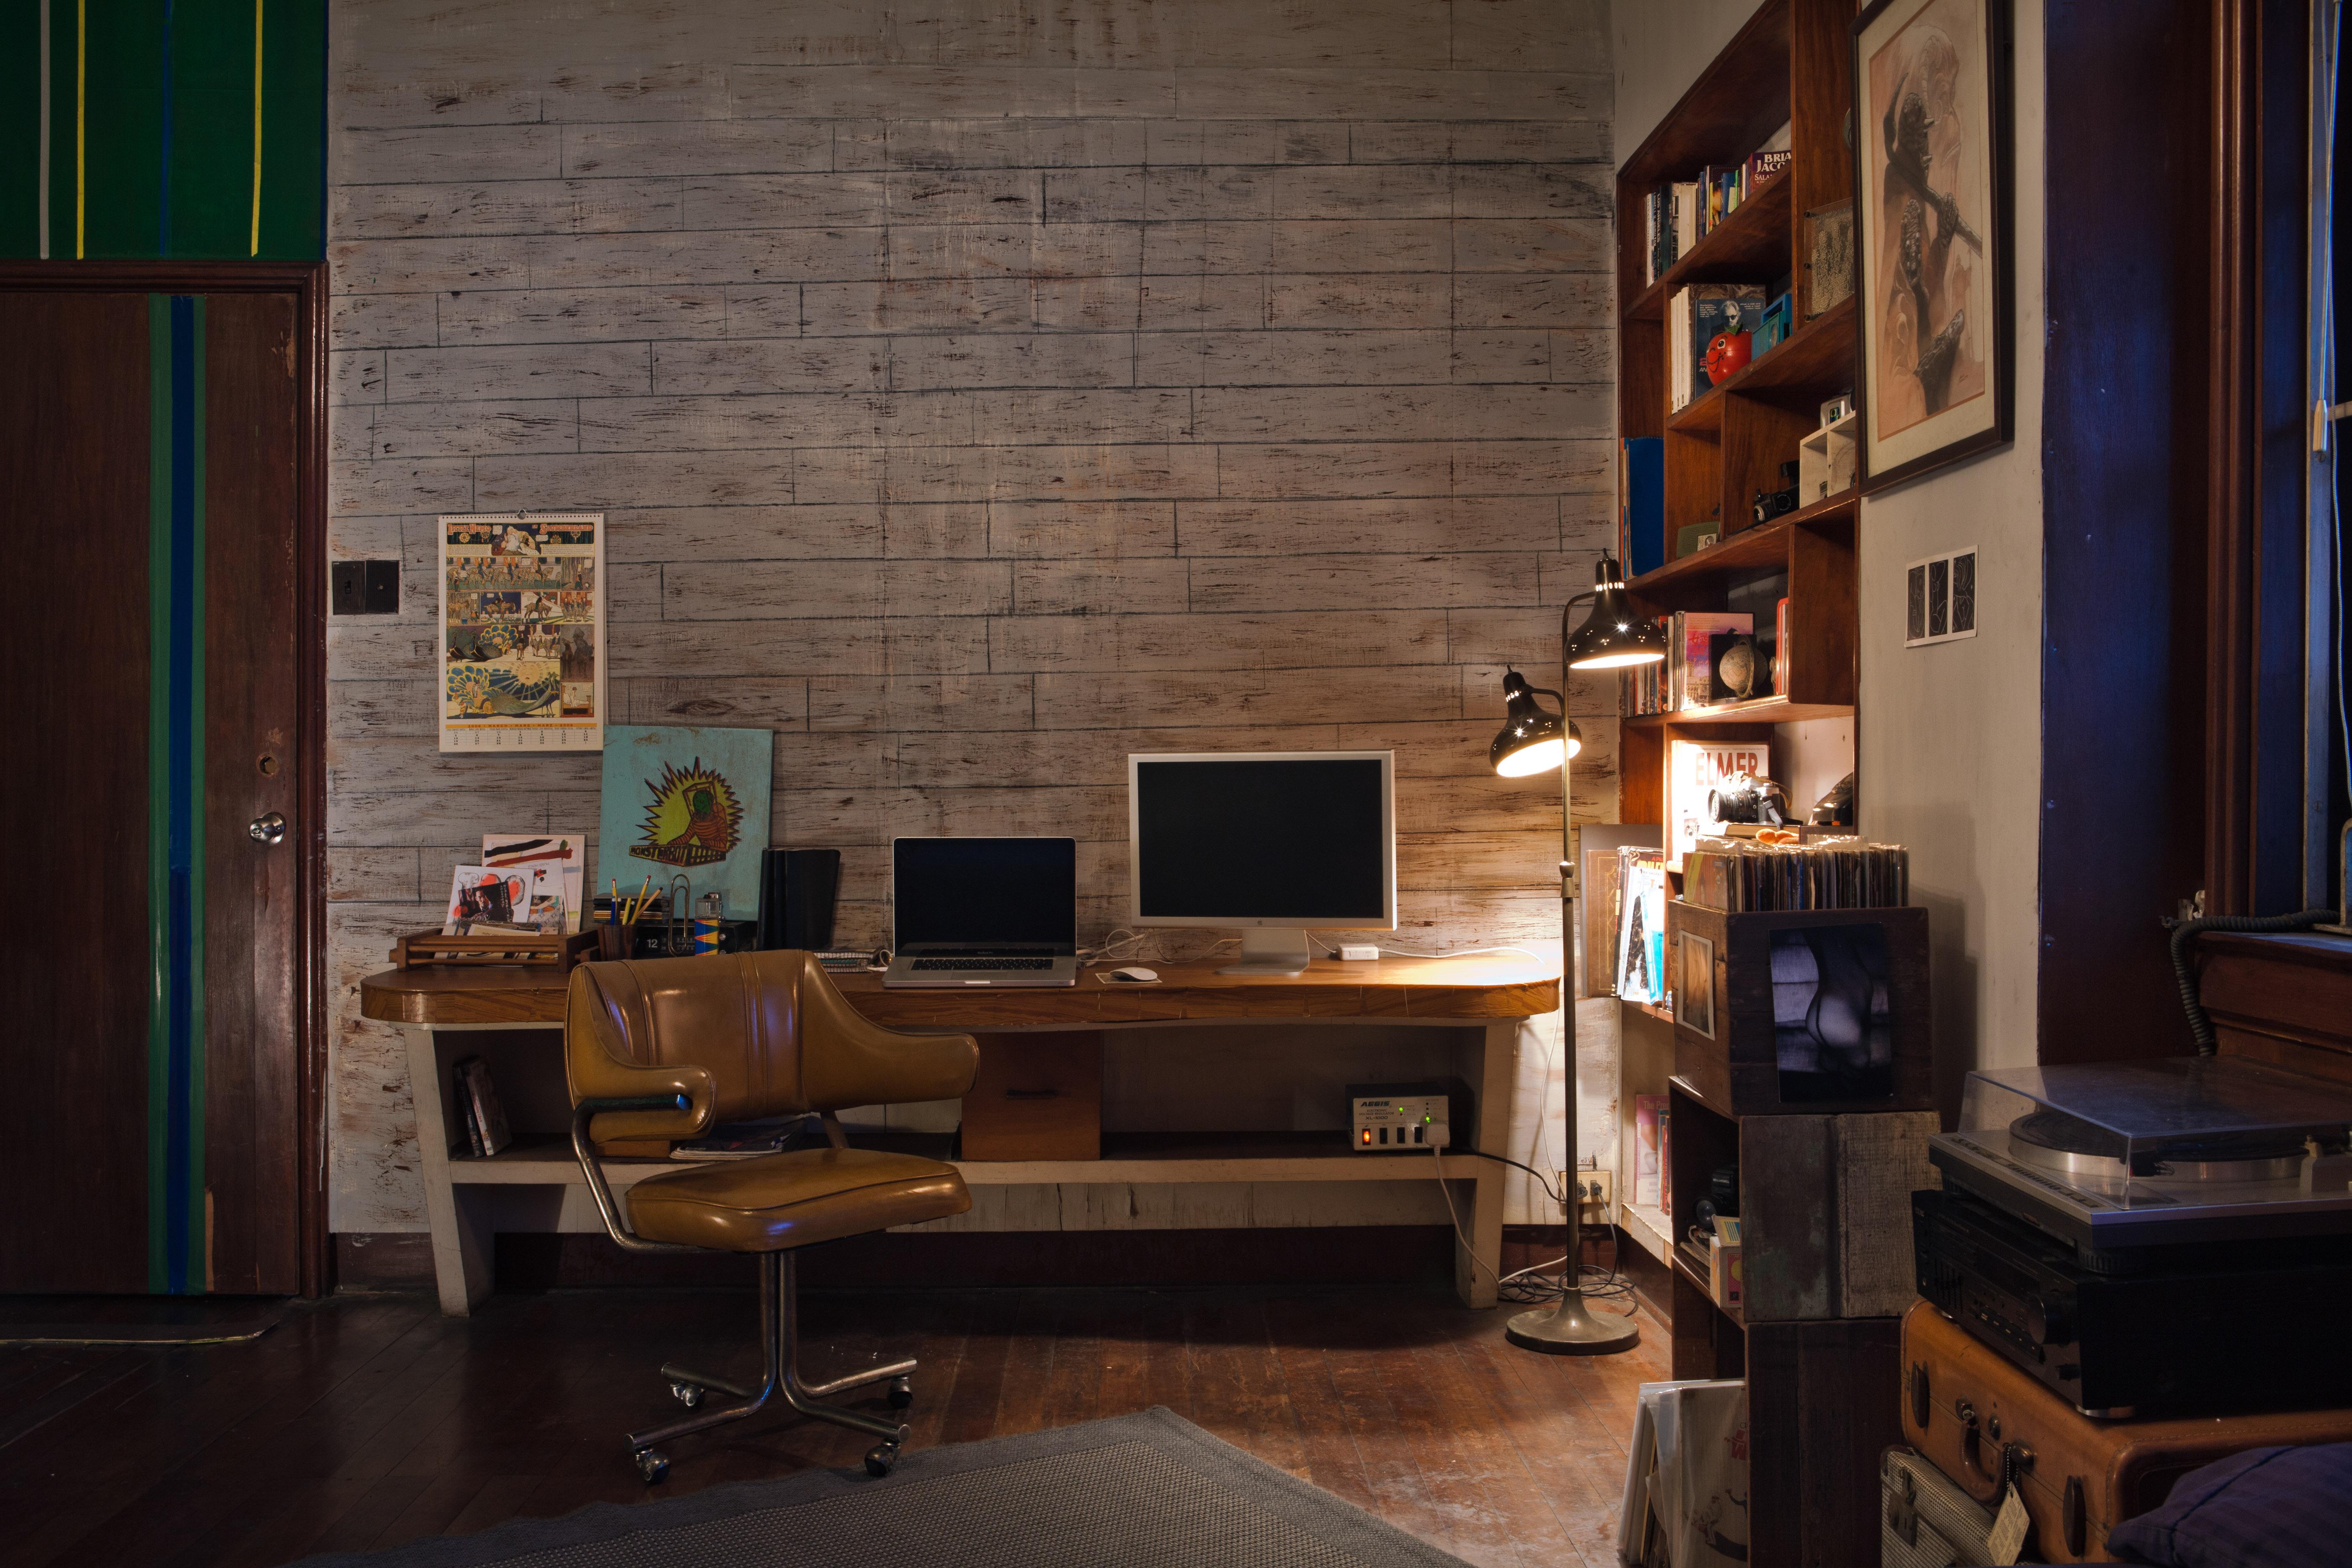 mismatched bedroom furniture ideas photo - 6